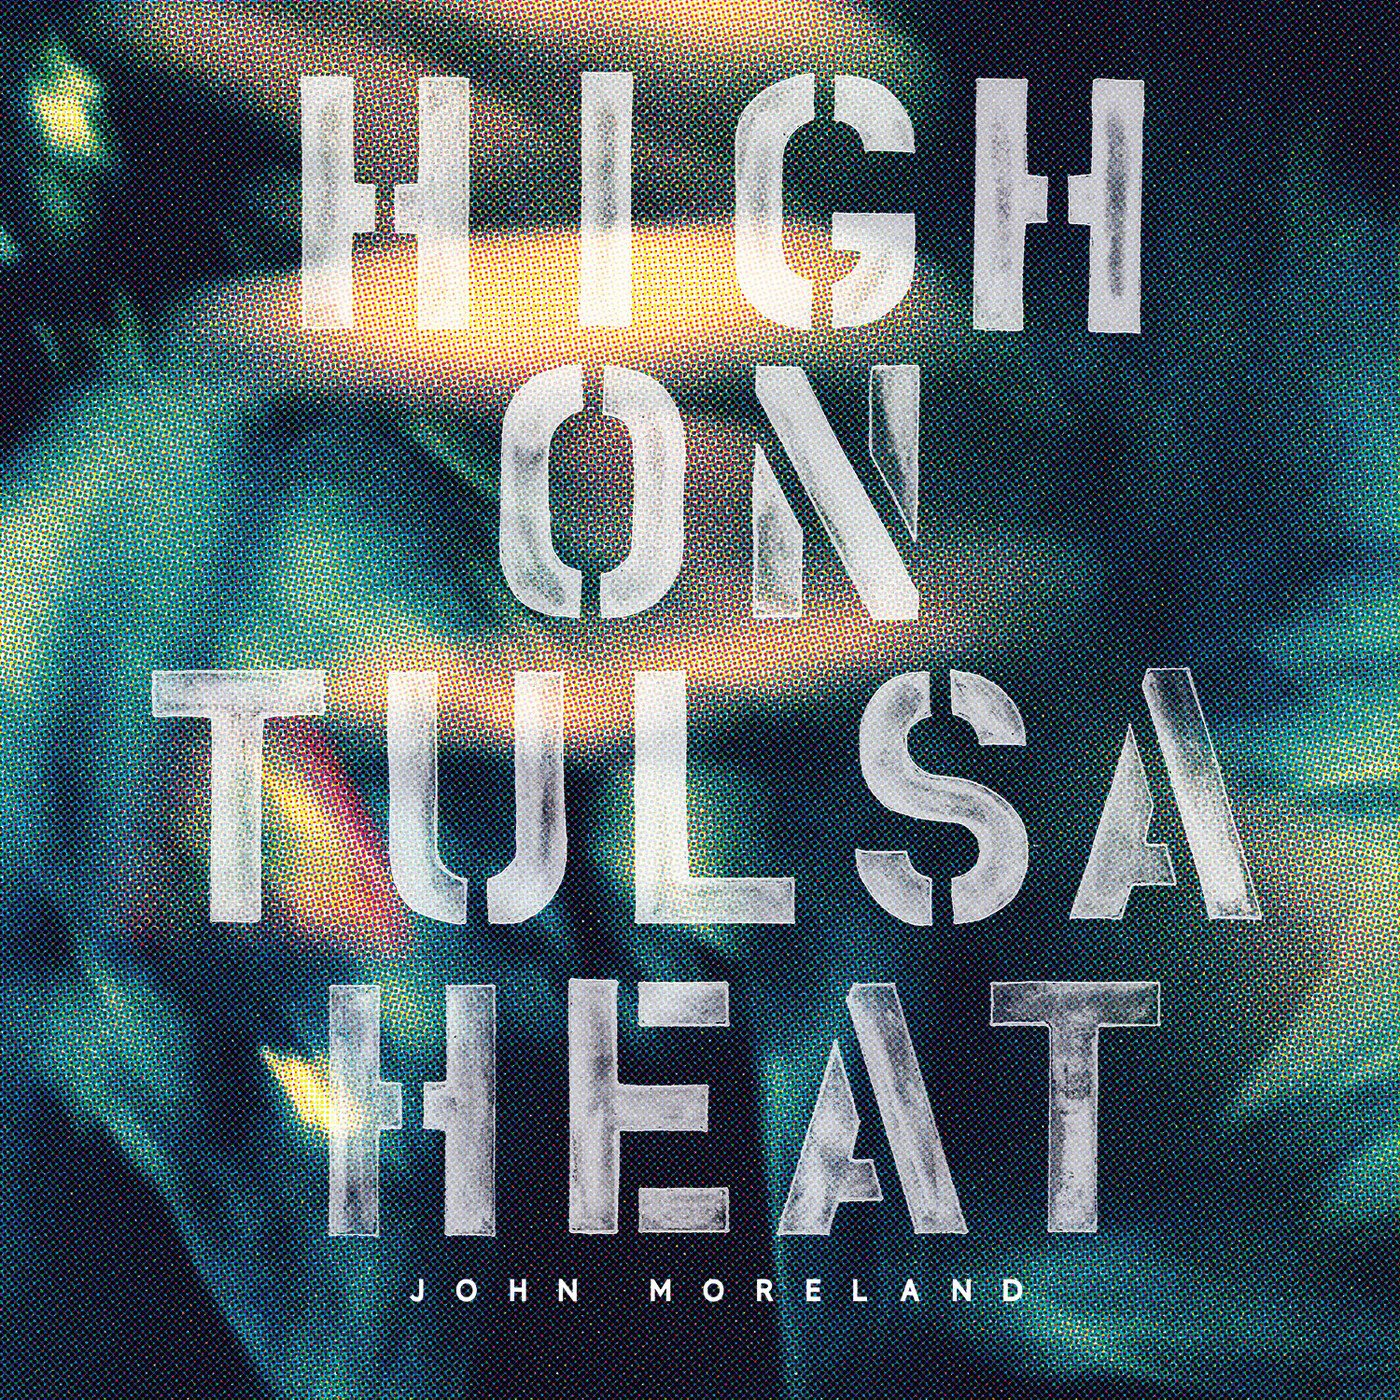 John Moreland - High On Tulsa Heat (2015) [FLAC] Download